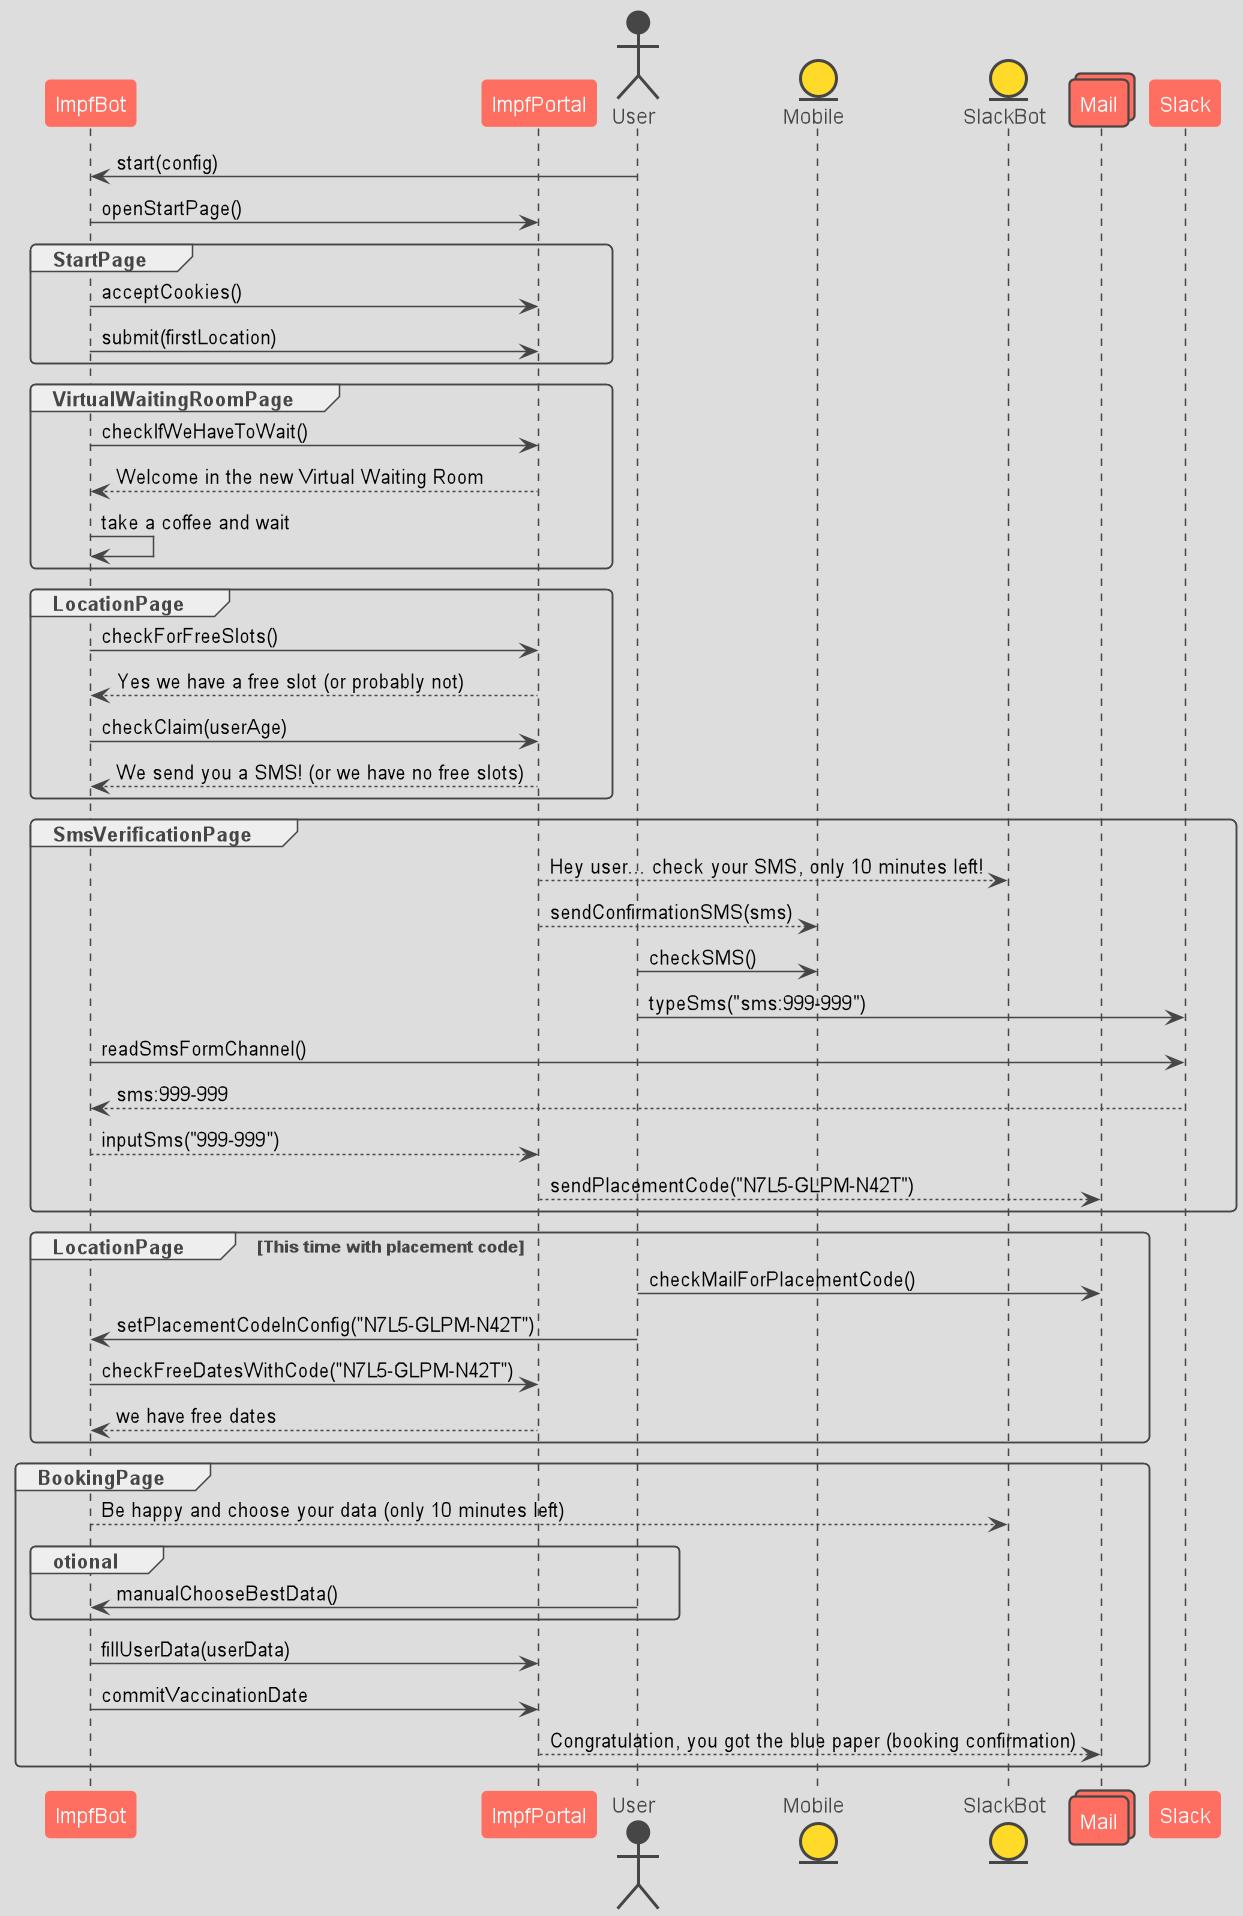 Sequence Digramm